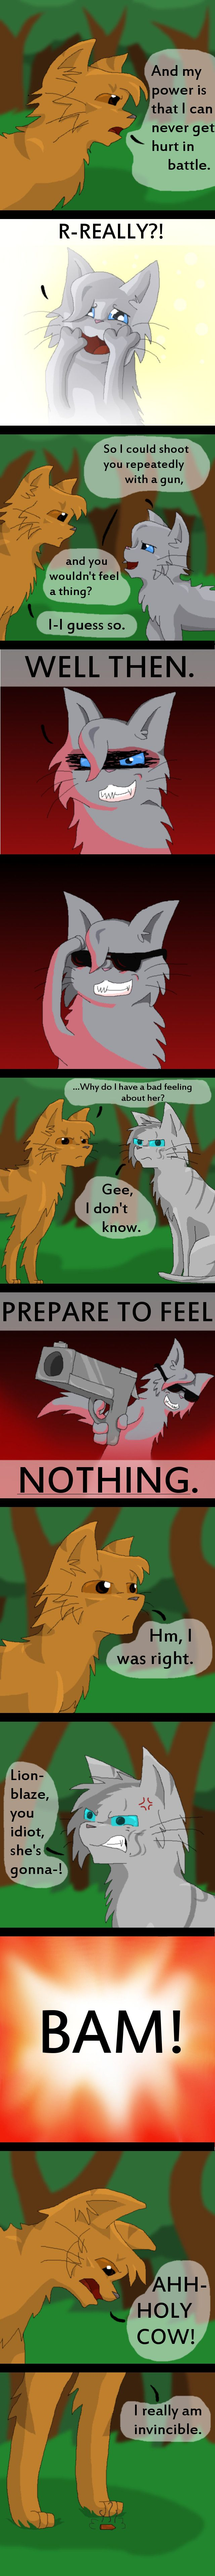 Warrior Cats- She's Crazy Dude (REAL) by whatchyagonnado.deviantart.com on @deviantART